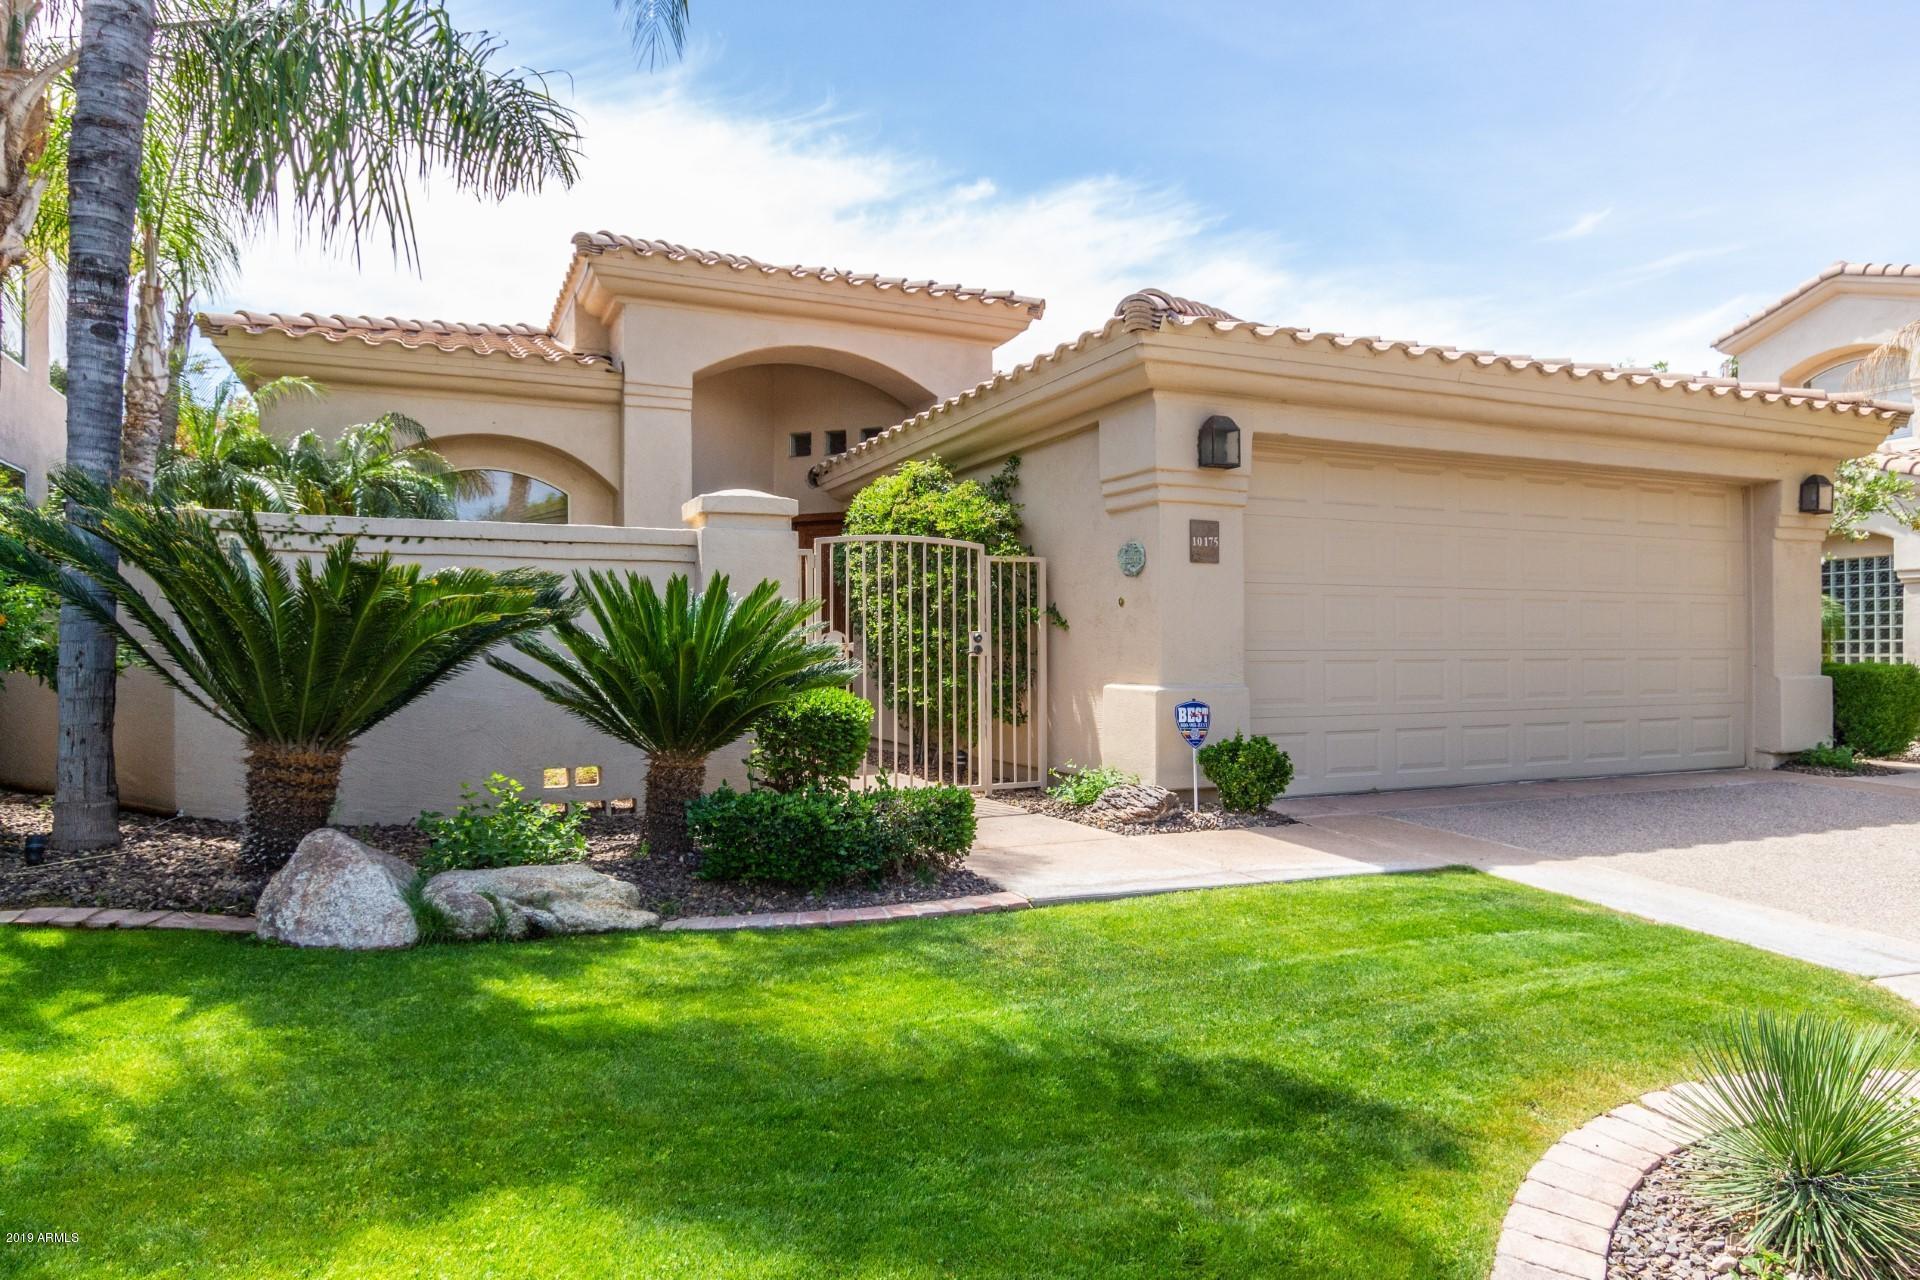 Photo of 10175 E COCHISE Drive, Scottsdale, AZ 85258